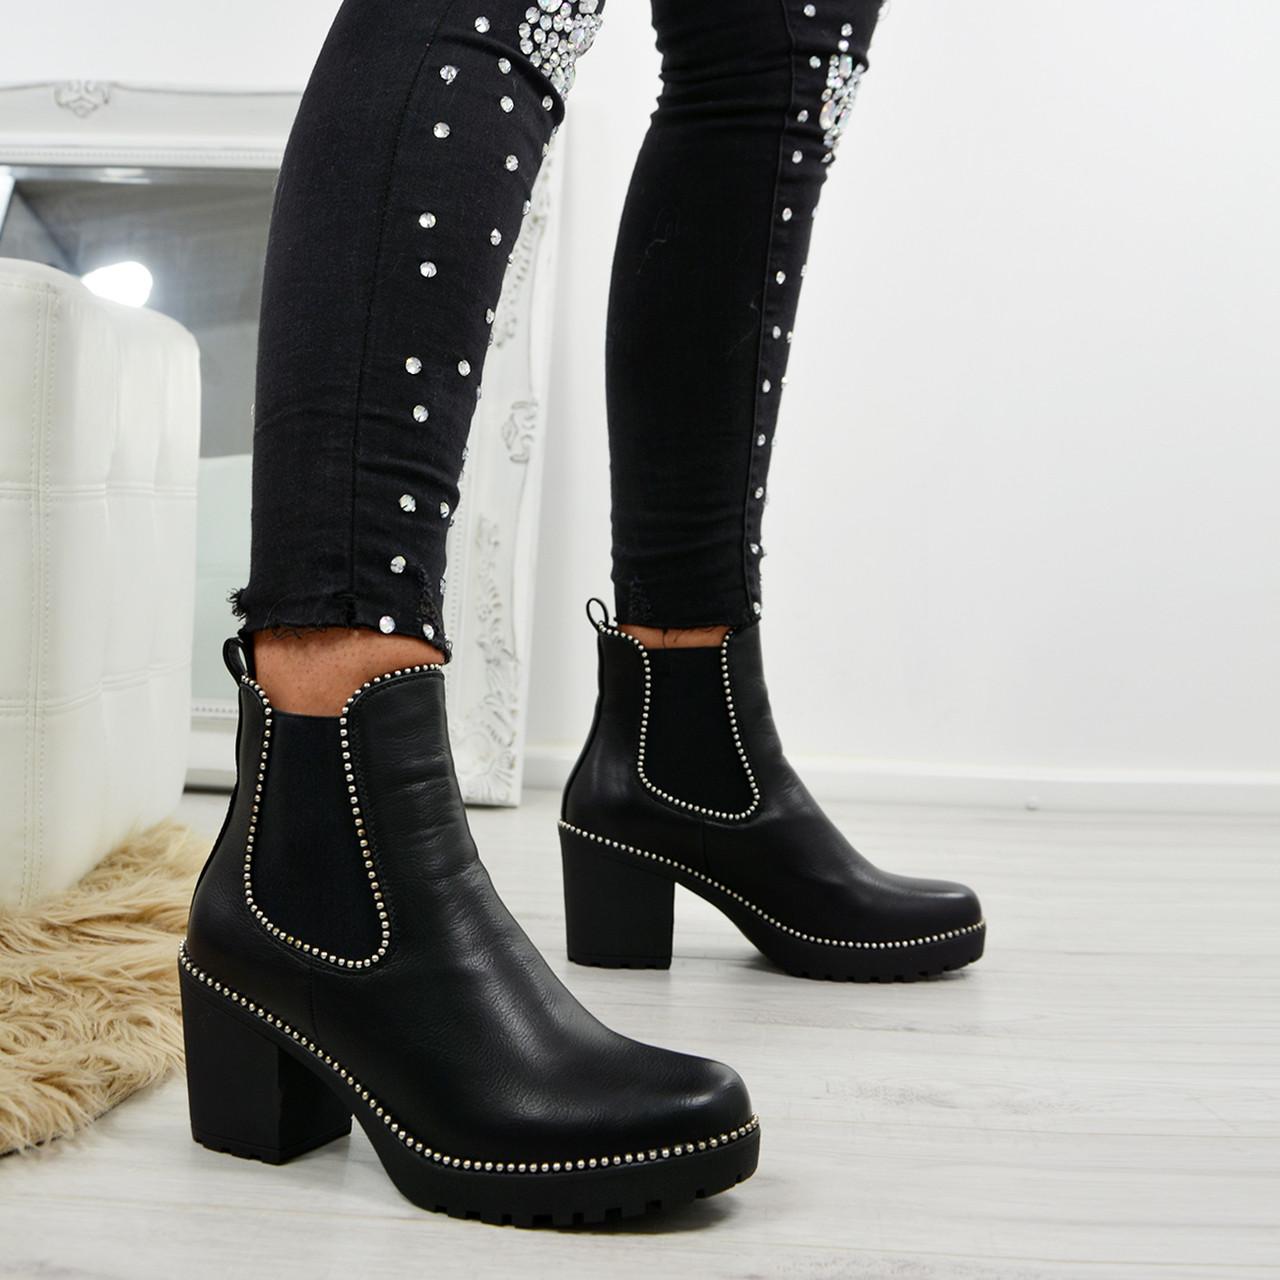 b83a3ae0788 Ayana Black Pu Chunky Ankle Boots